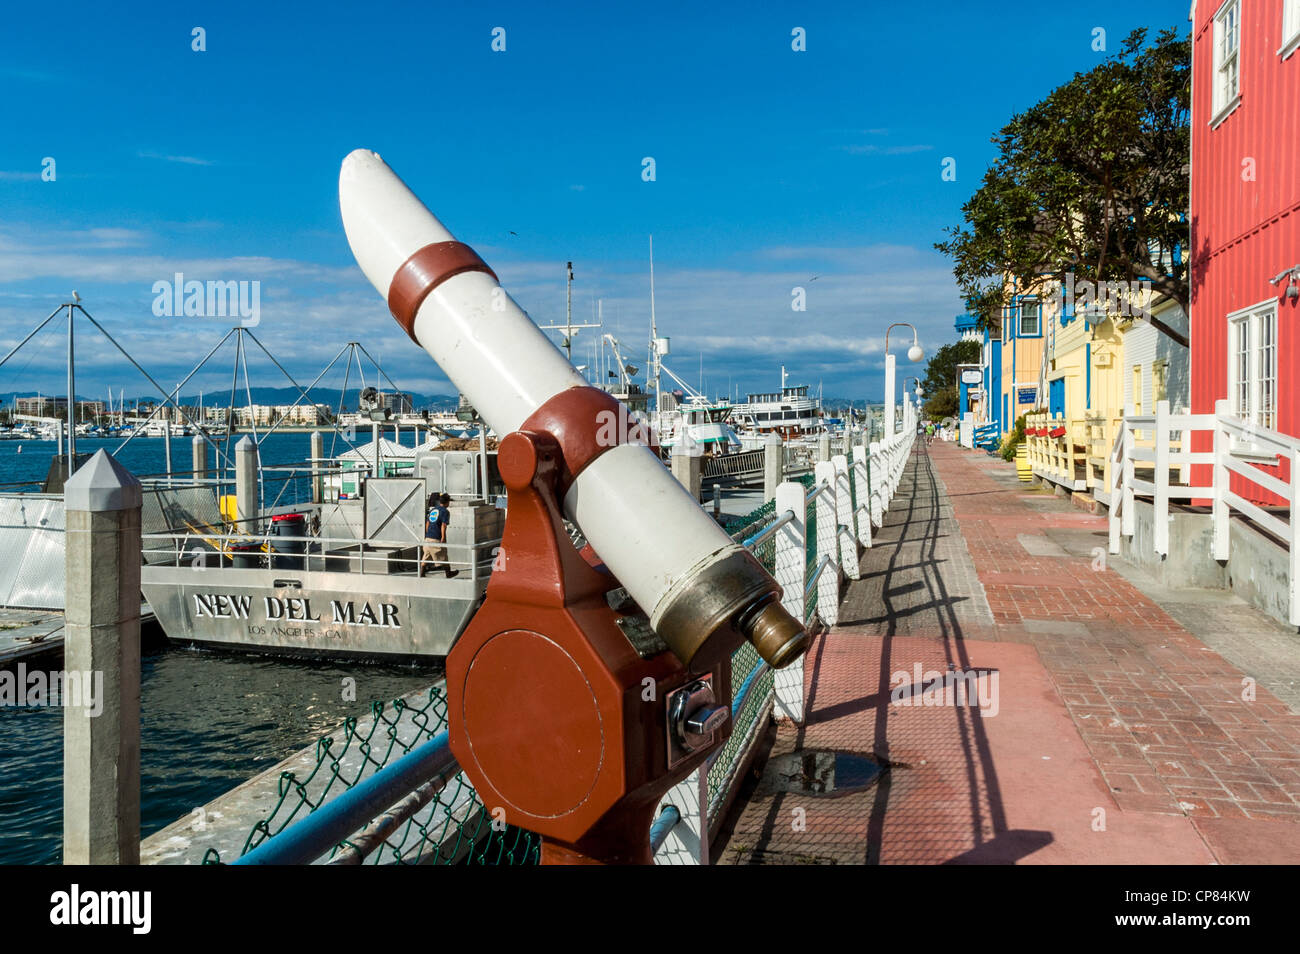 Münzautomaten Teleskop am Marina del Rey, Kalifornien, USA Stockbild